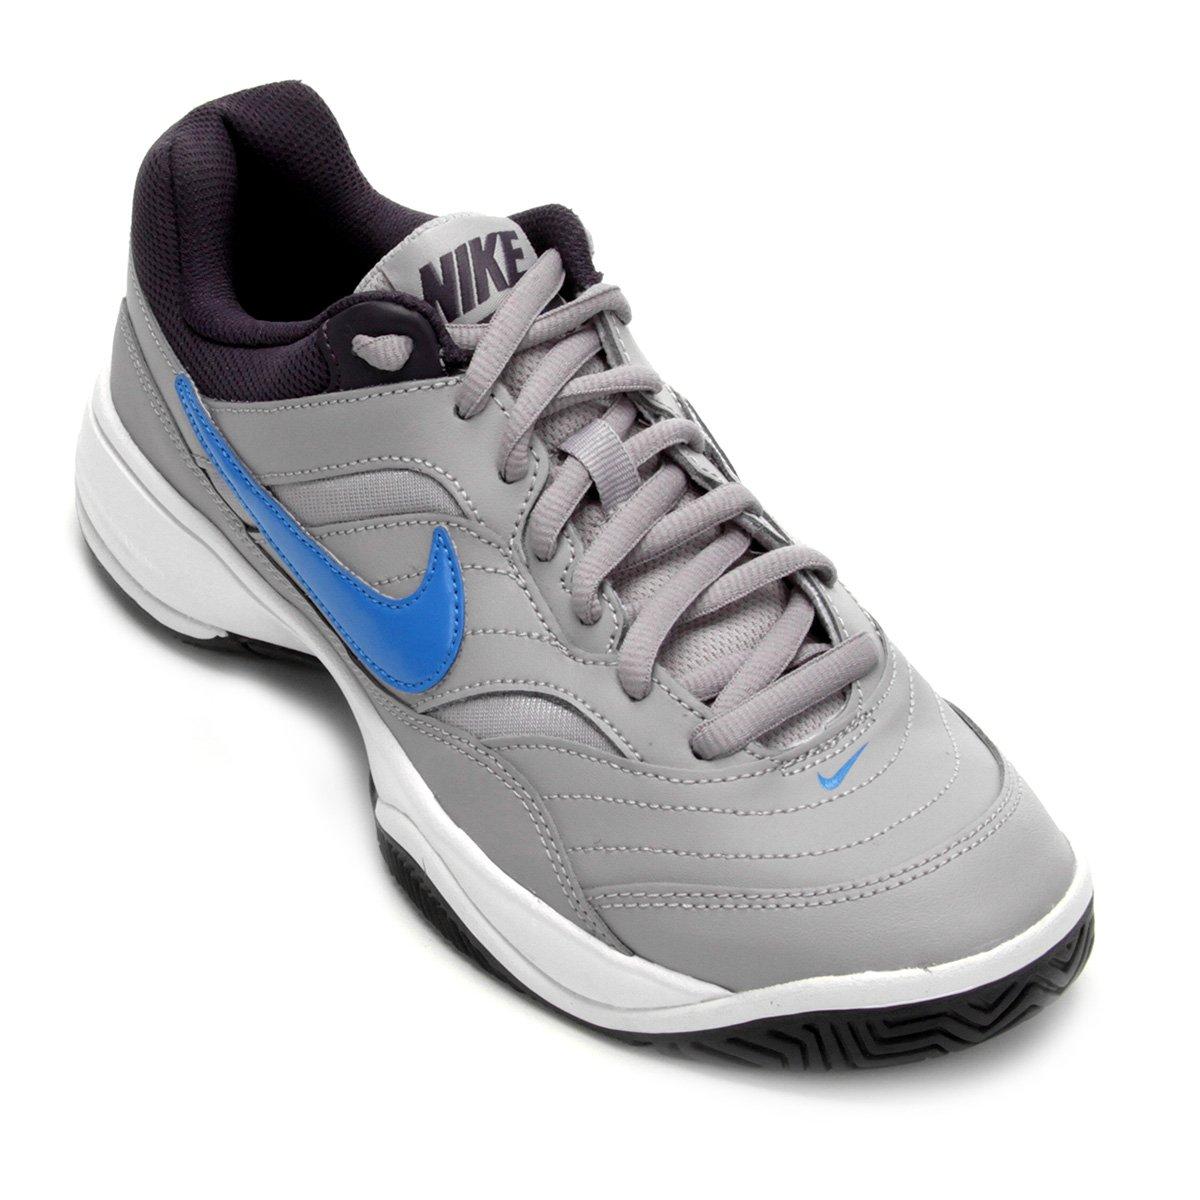 01dacd9fb80ee Tênis Nike Court Lite Masculino - Cinza e Azul Claro   Shop Timão